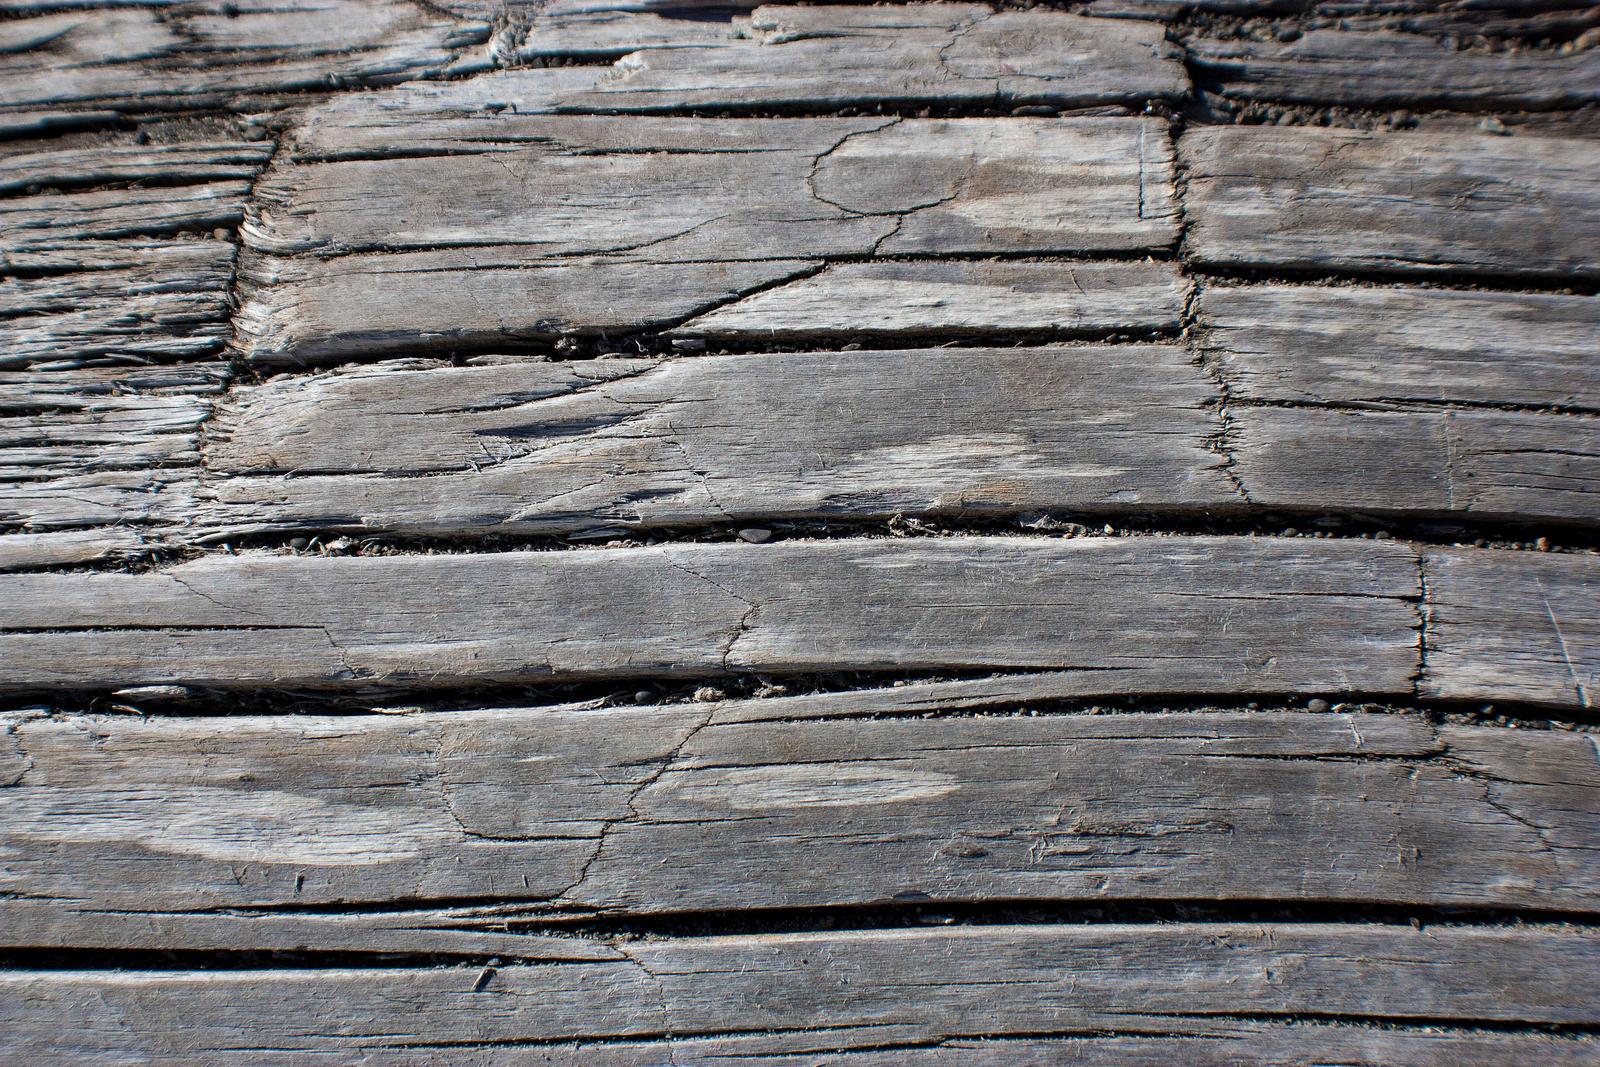 driftwood texture 3 by kariloumc on deviantart